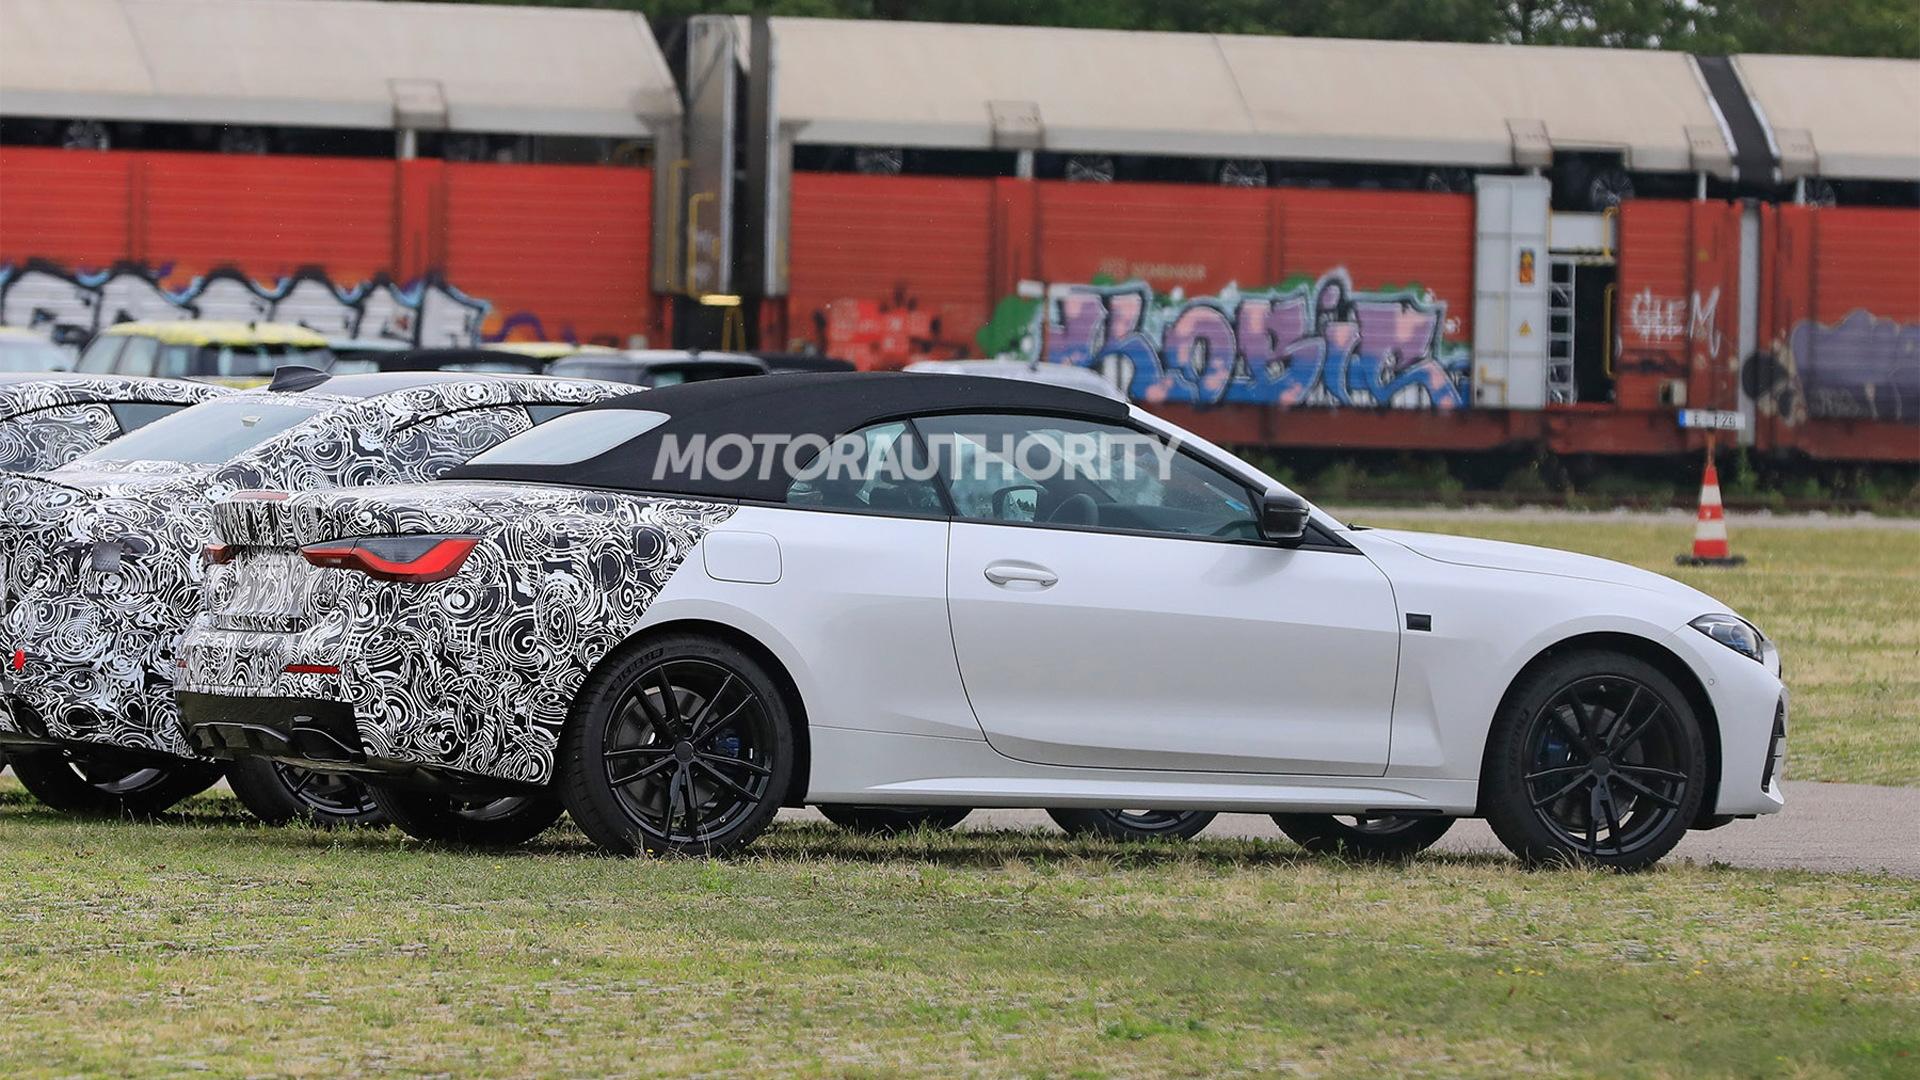 2021 BMW 4-Series Convertible spy shots - Photo credit: S. Baldauf/SB-Medien